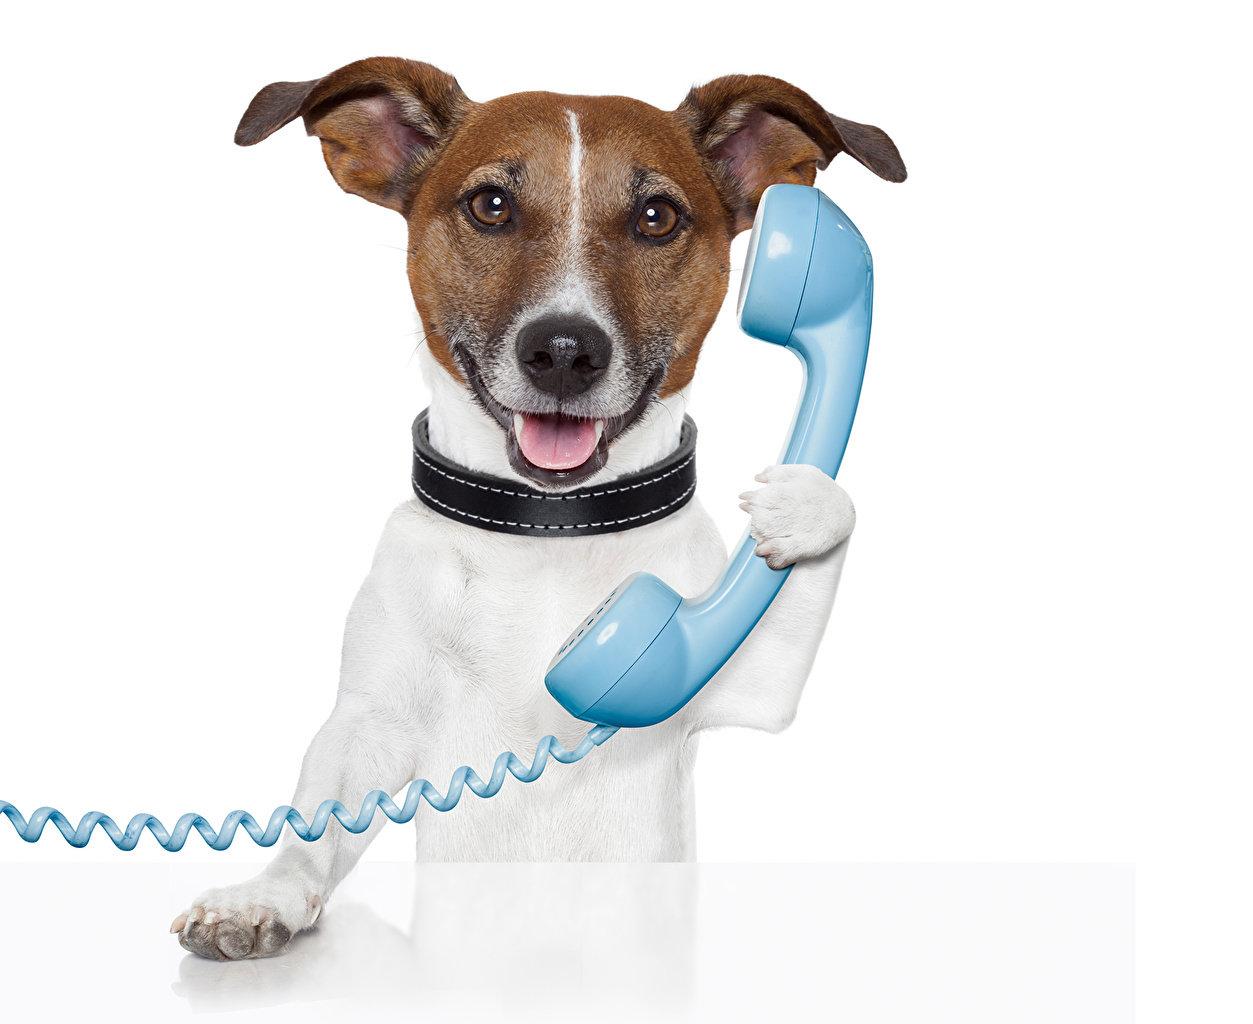 TELEPHONE SKILLS VIRTUAL GROUP TRAINING